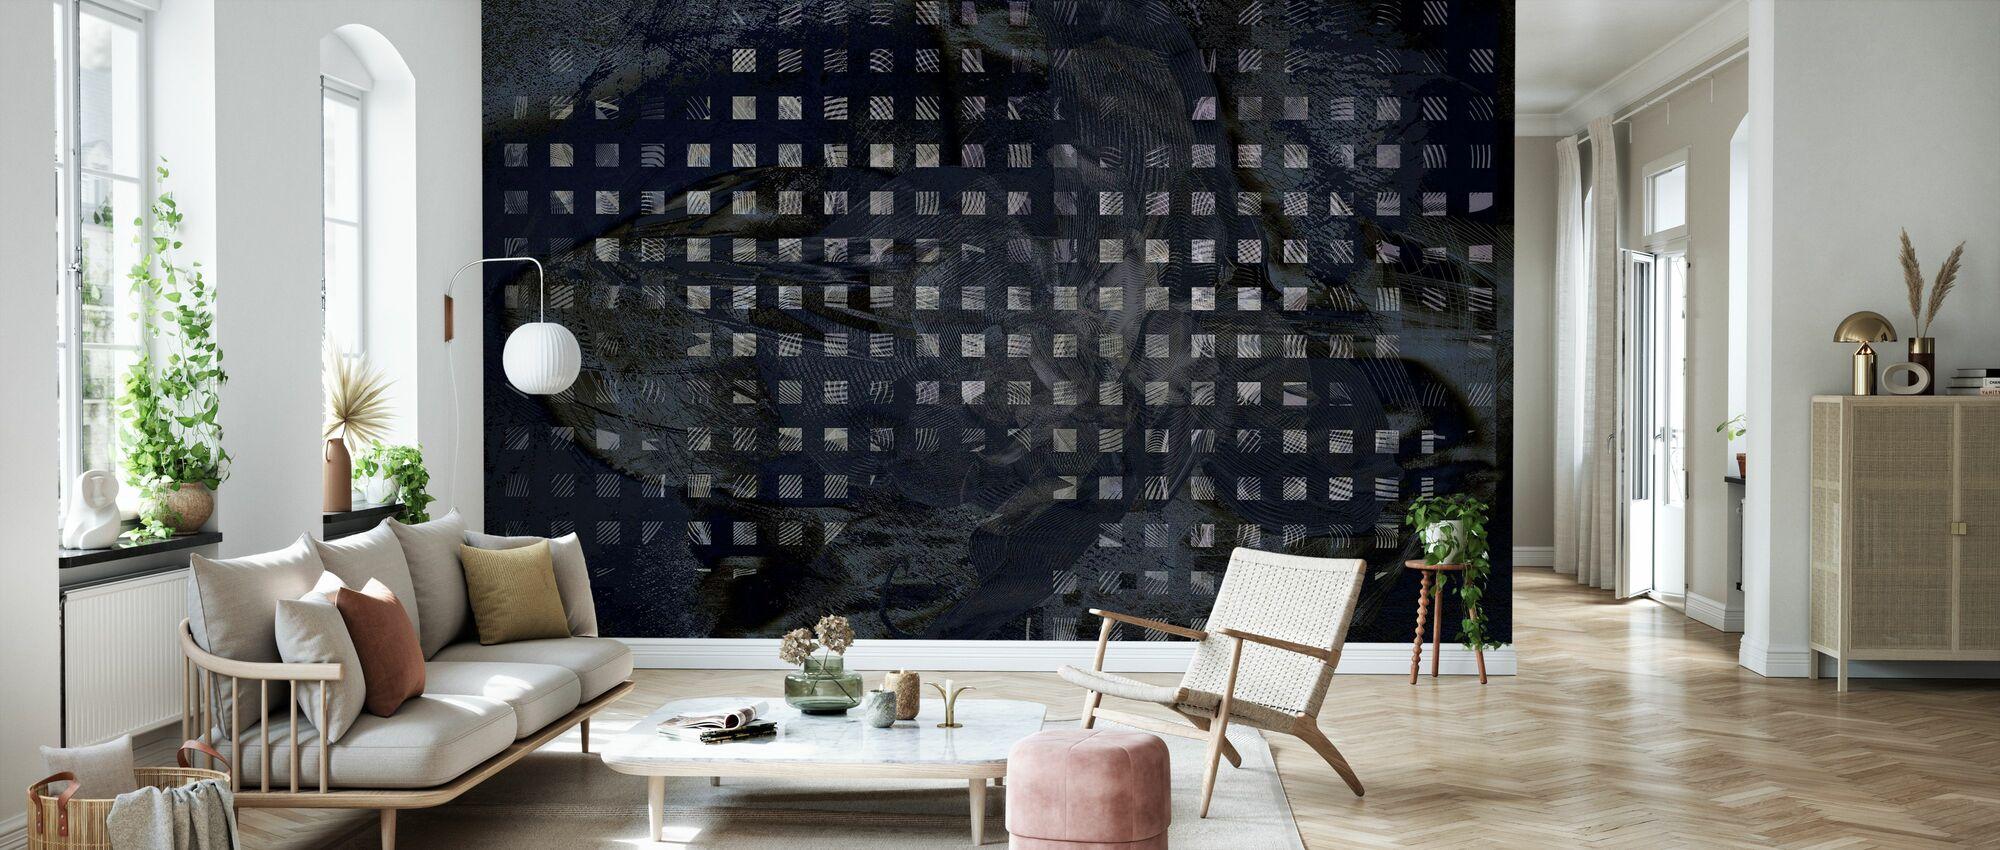 Orchid Chaos - Black - Wallpaper - Living Room